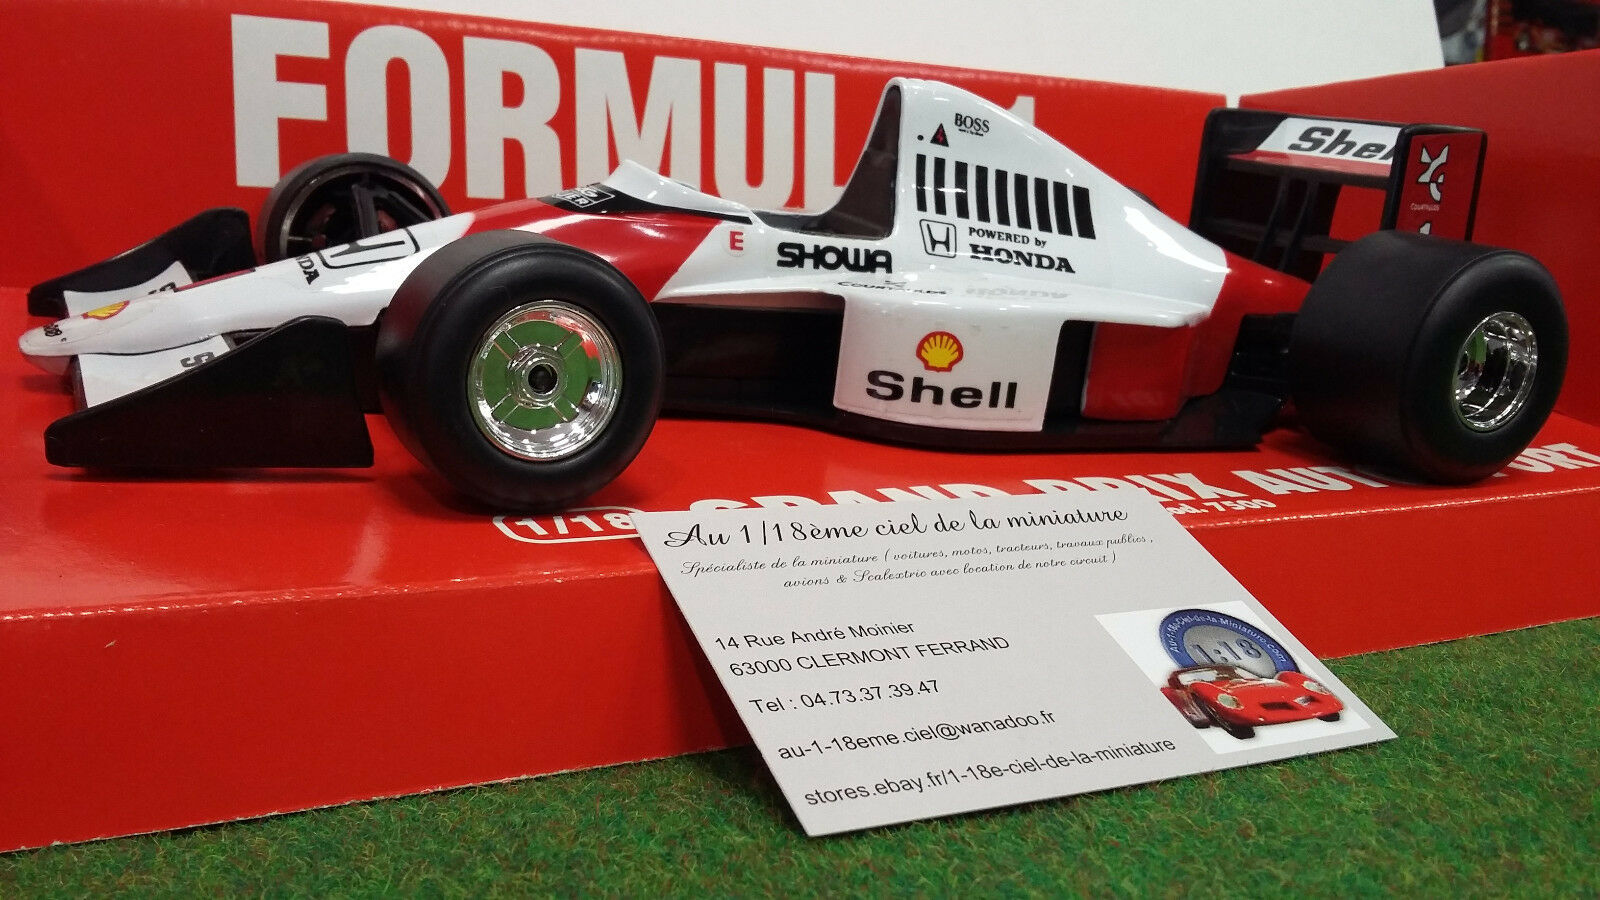 F1 McLAREN HONDA   1  1 18 RUOTE STERZANTI 7500 voiture miniature de collection